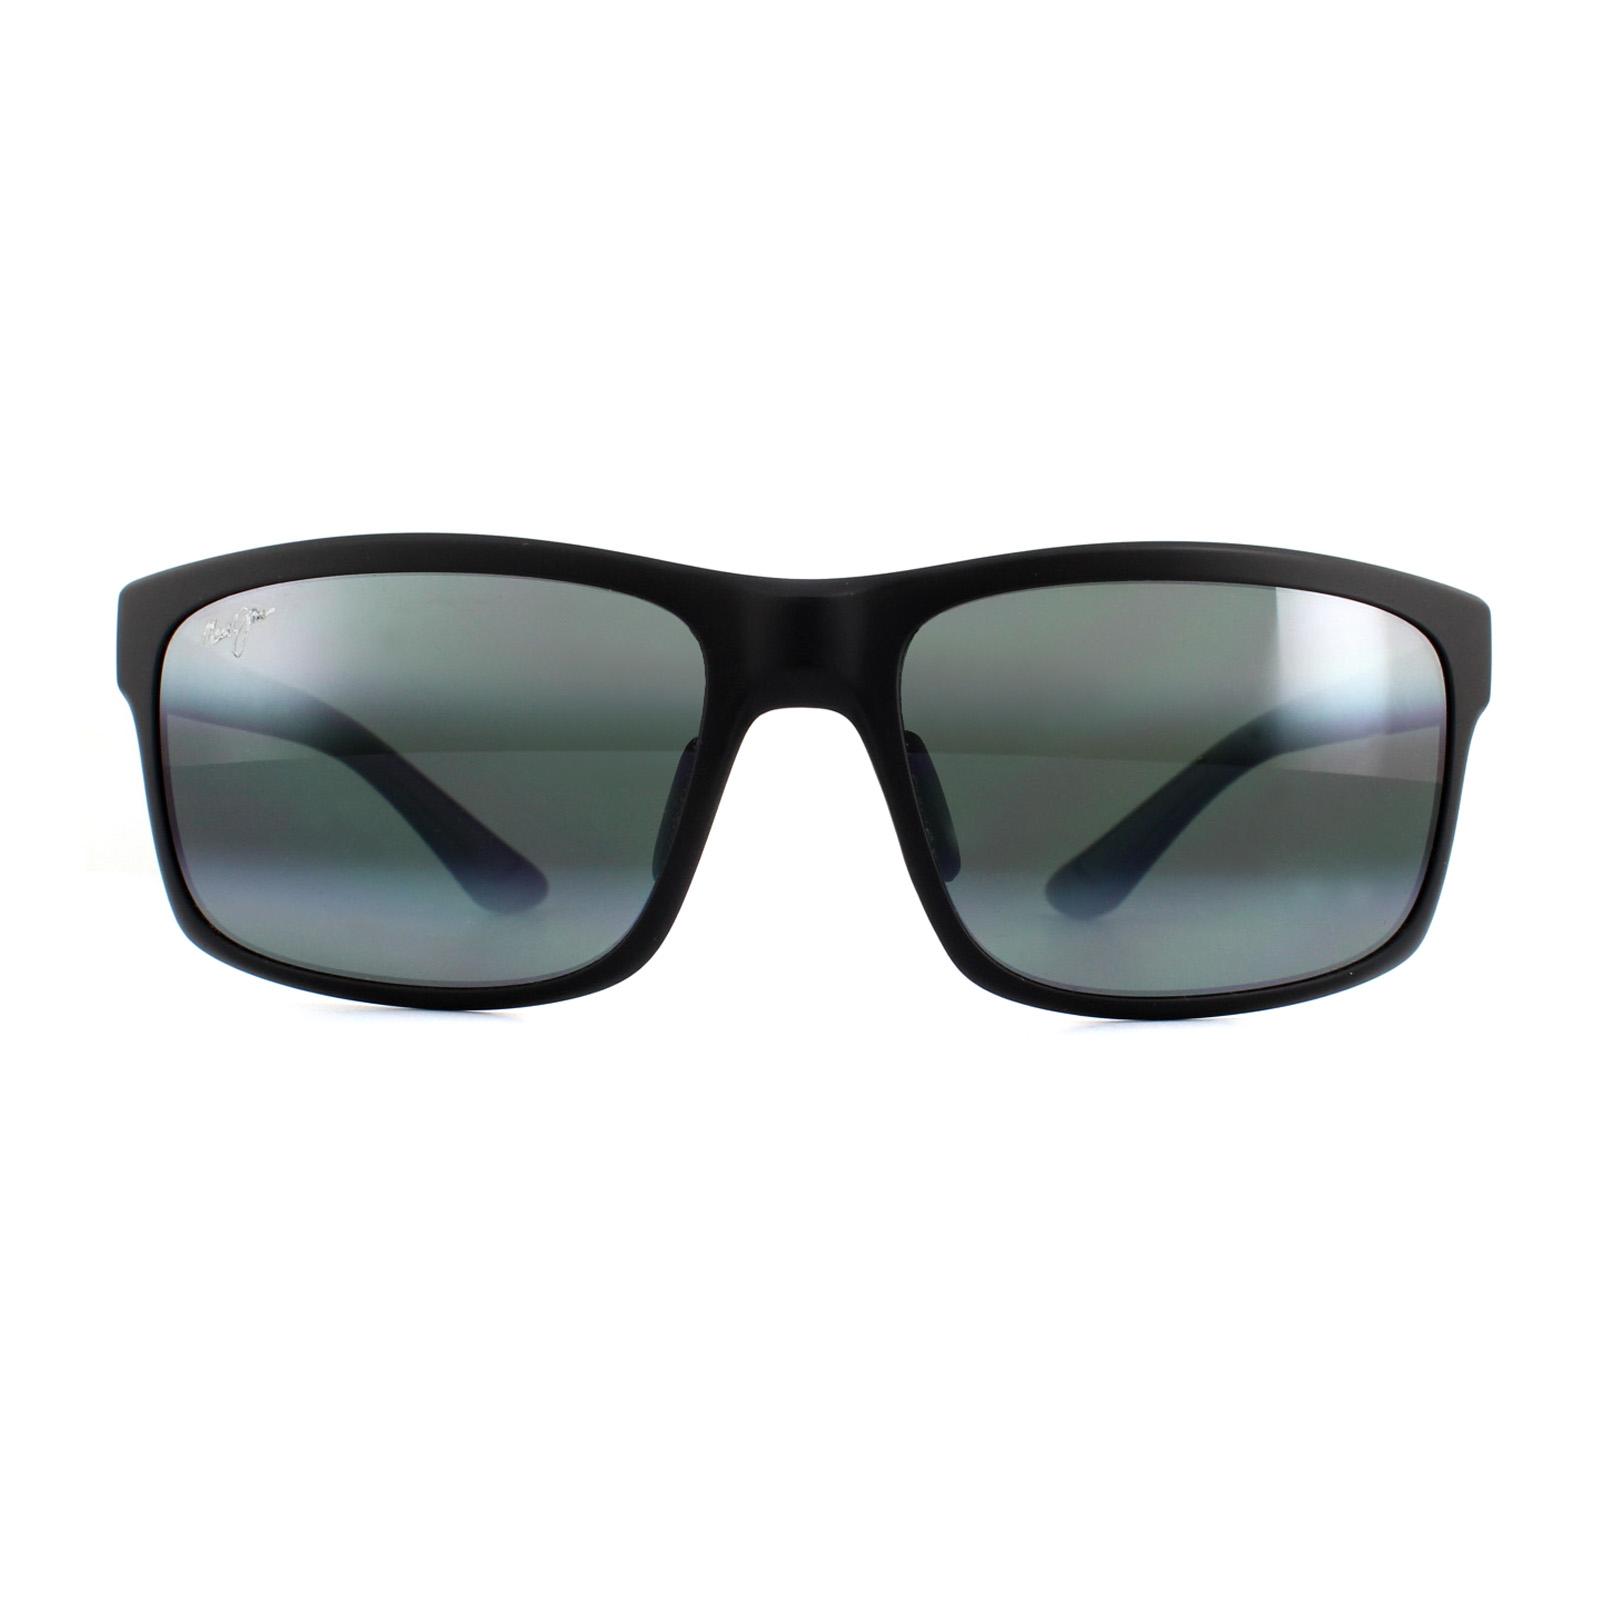 223da04557 Sentinel Maui Jim Sunglasses Pokowai Arch 439-2M Matte Black Neutral Grey  Polarized